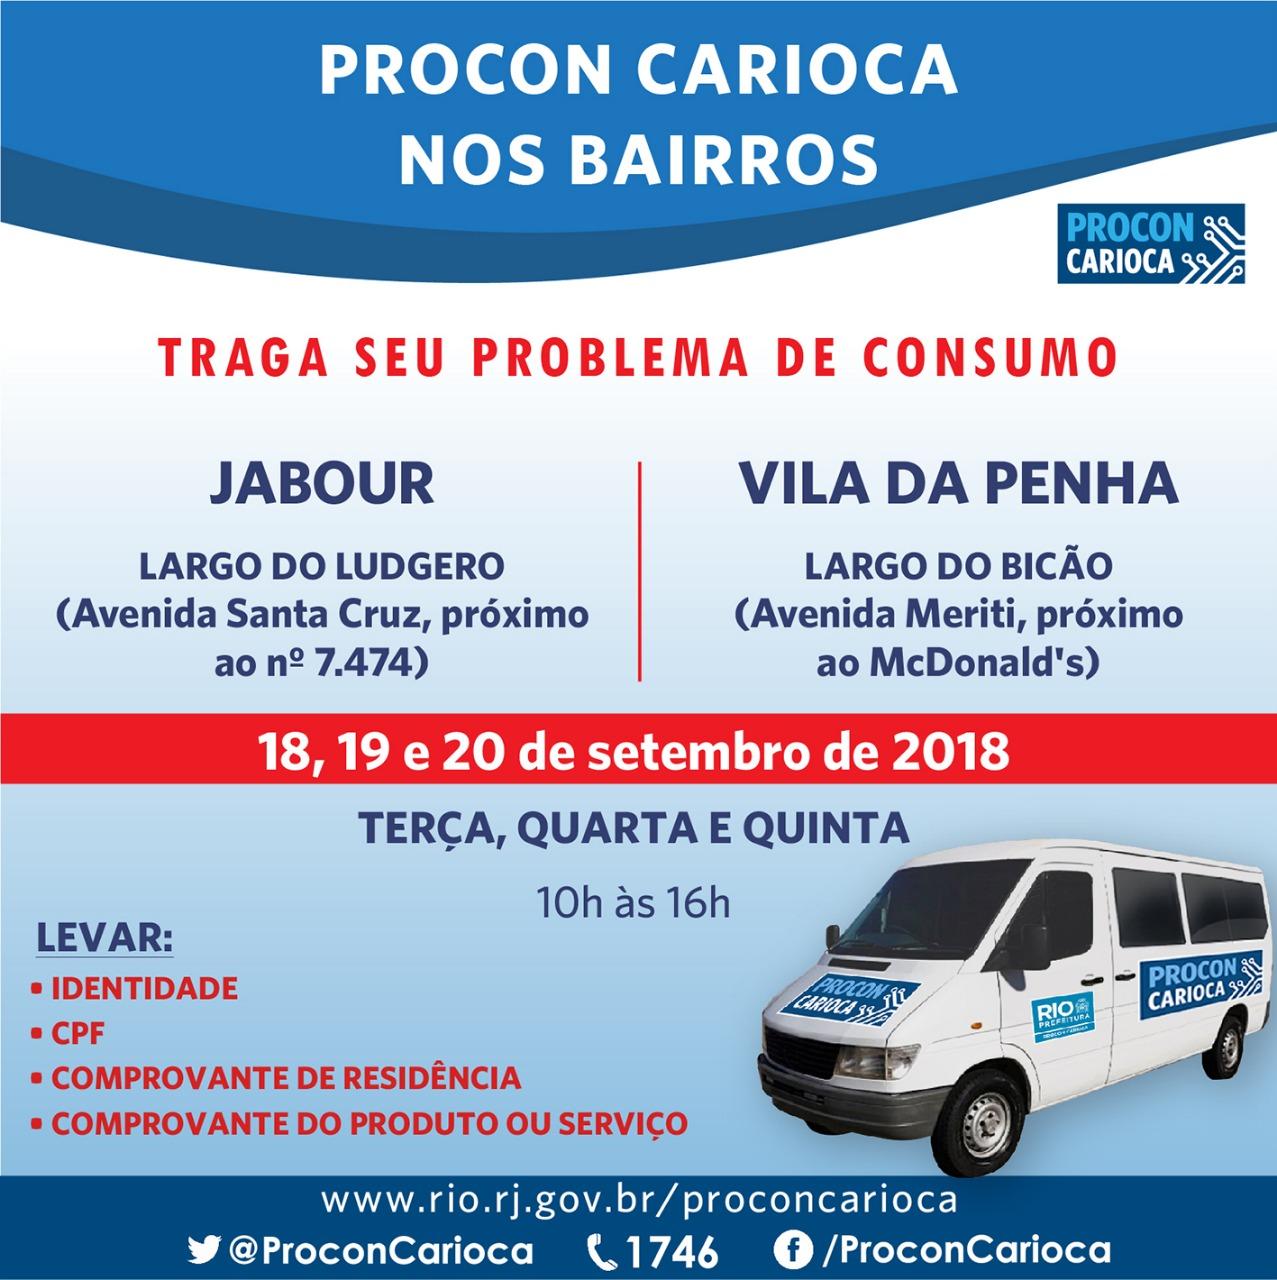 Atendimento itinerante do Procon Carioca chega ao Jabour e à Vila da Penha